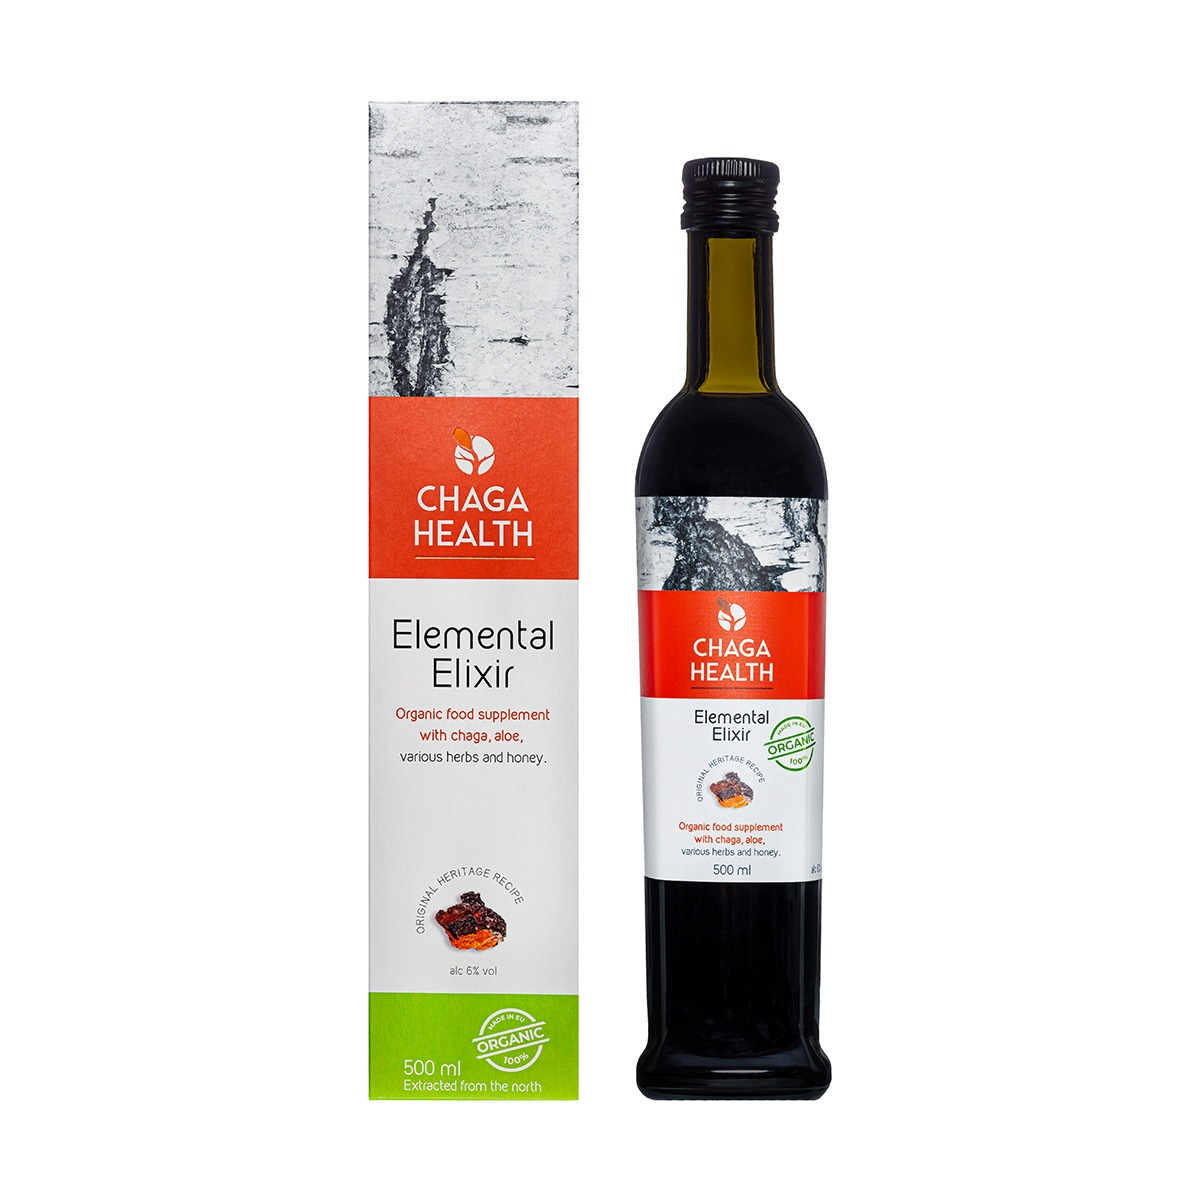 CHAGA Elemental Elixir, 500ml ÖKO